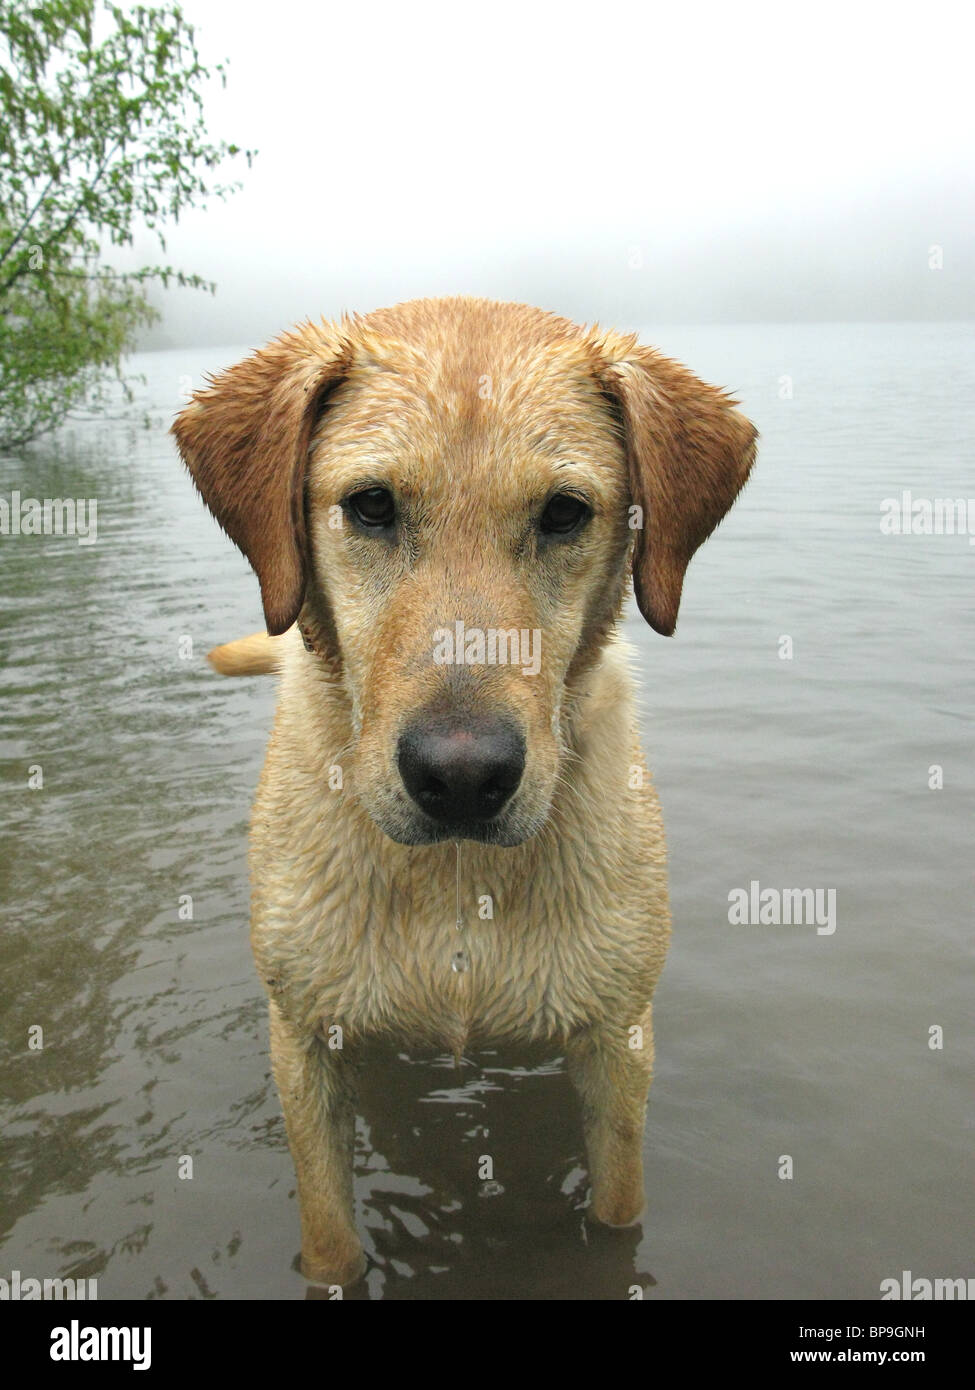 portrait of yellow Labrador retriever standing in lake - Stock Image